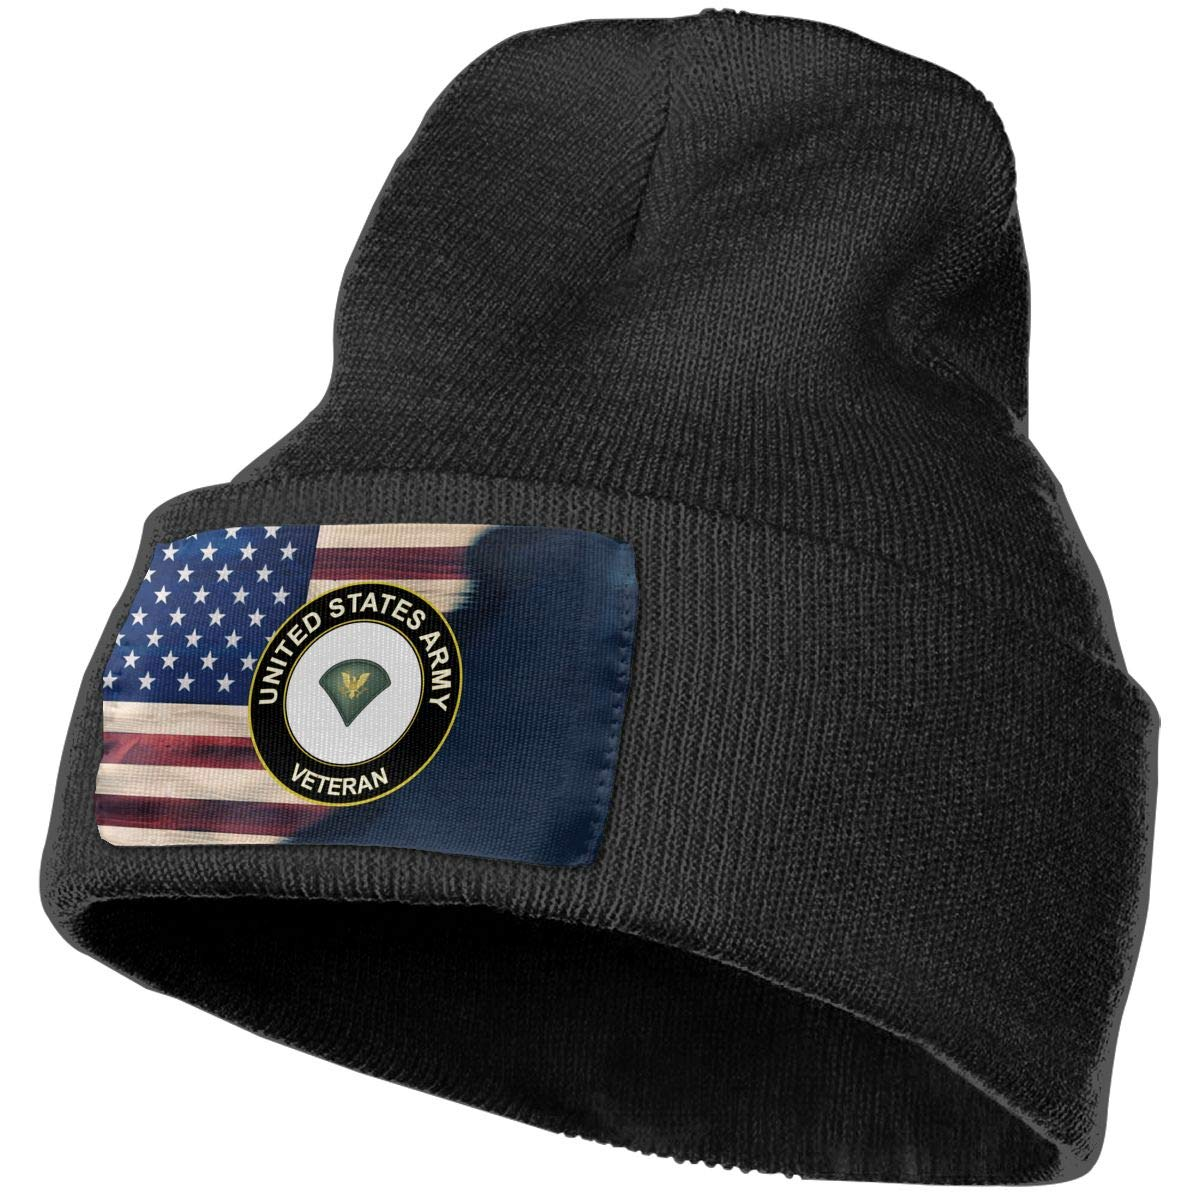 FORDSAN CP US Army Specialist Veteran Mens Beanie Cap Skull Cap Winter Warm Knitting Hats.